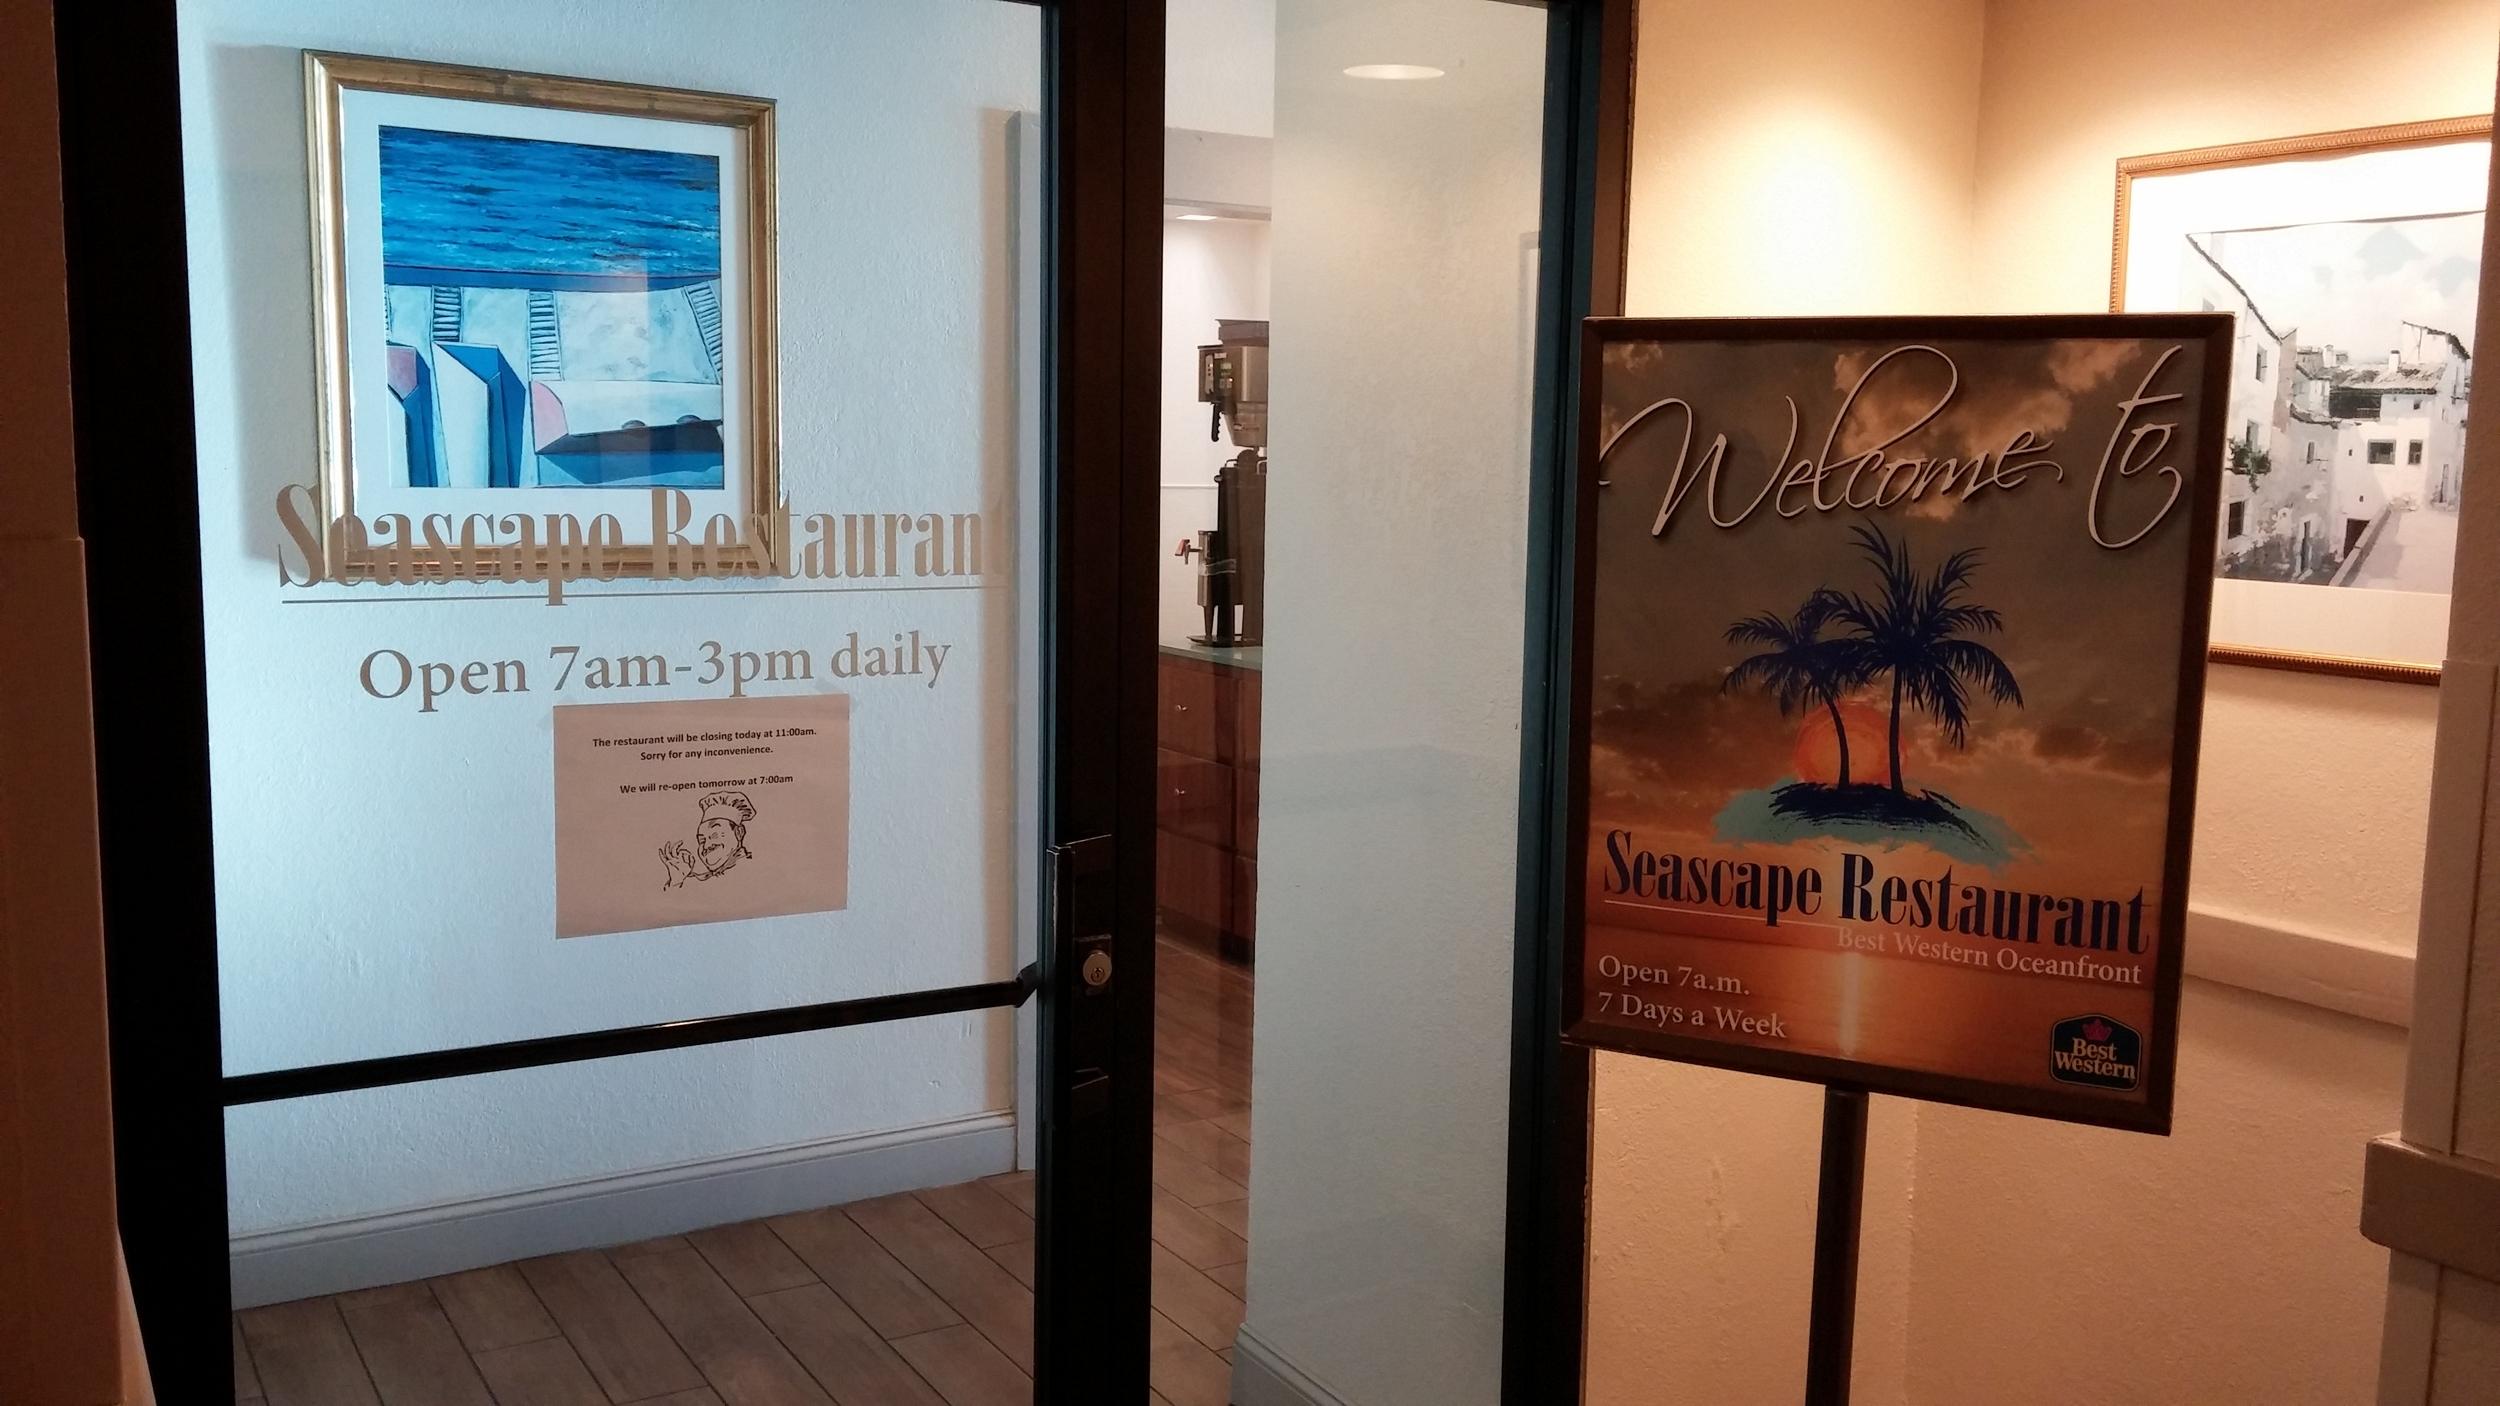 2016-01-11 Best Western New Smyrna Beach FL 4.jpg